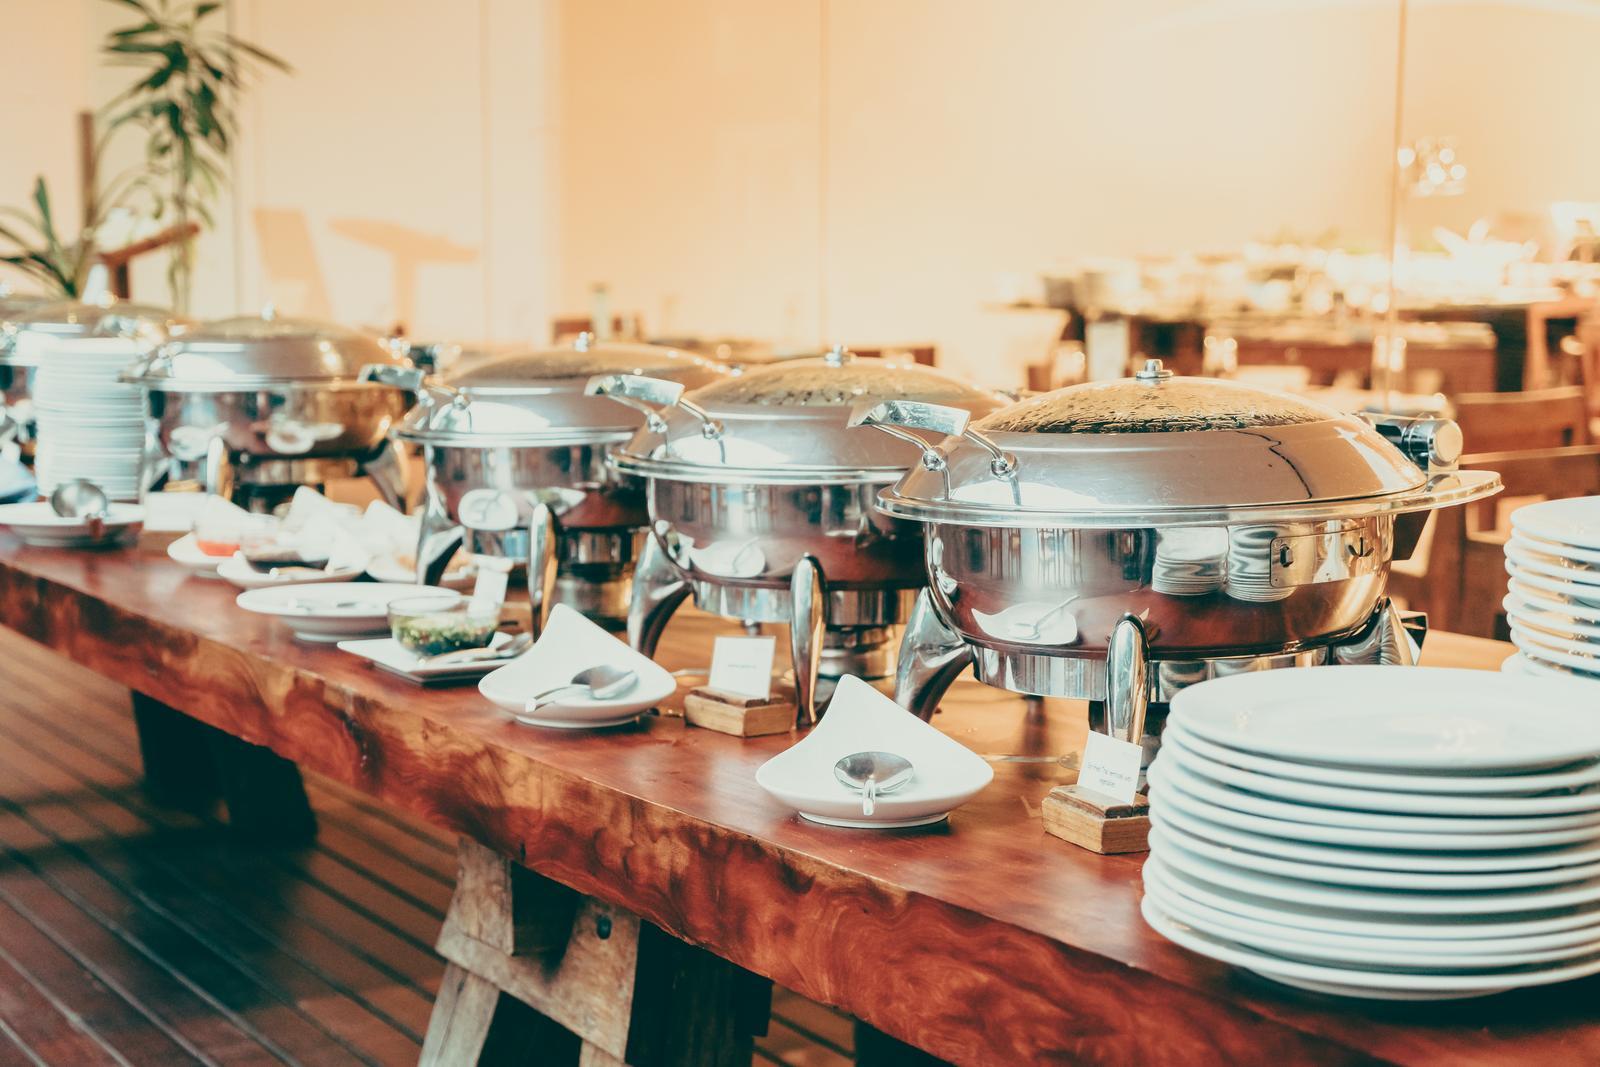 Toitlustus (restoran jm)  Tallinnas